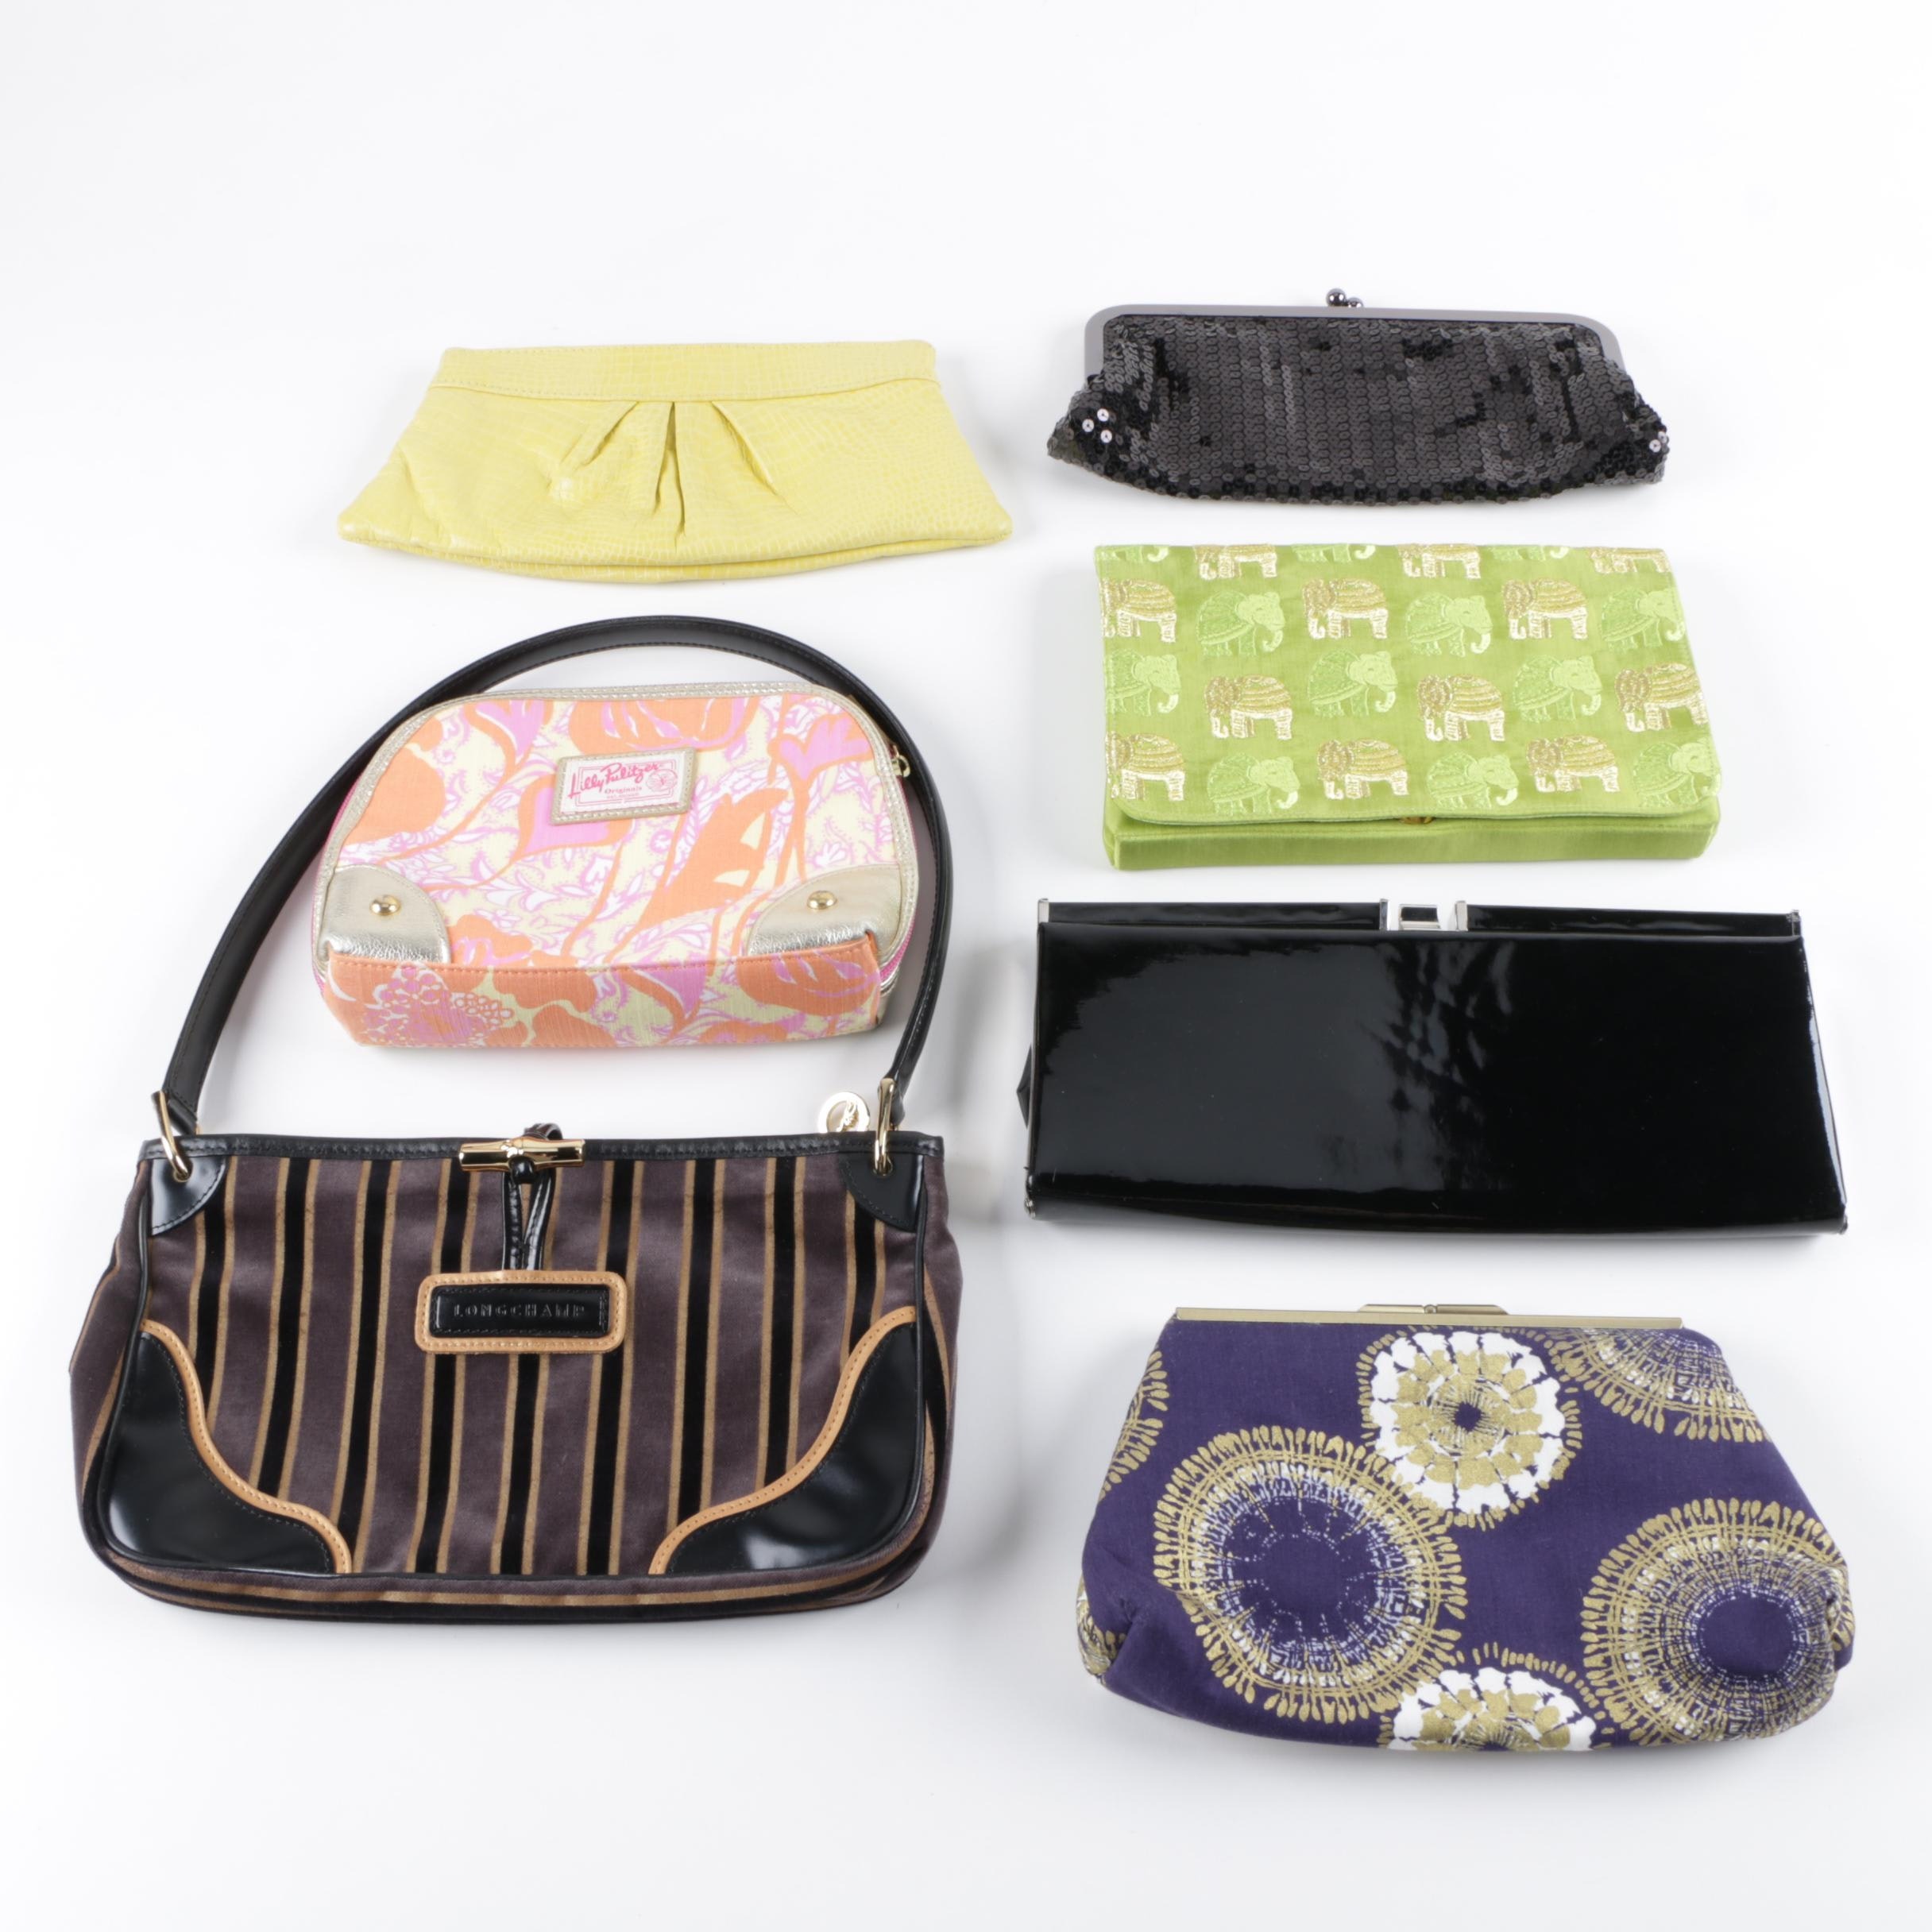 Longchamp, Lauren Merkin, Lilly Pulitzer and Other Clutches